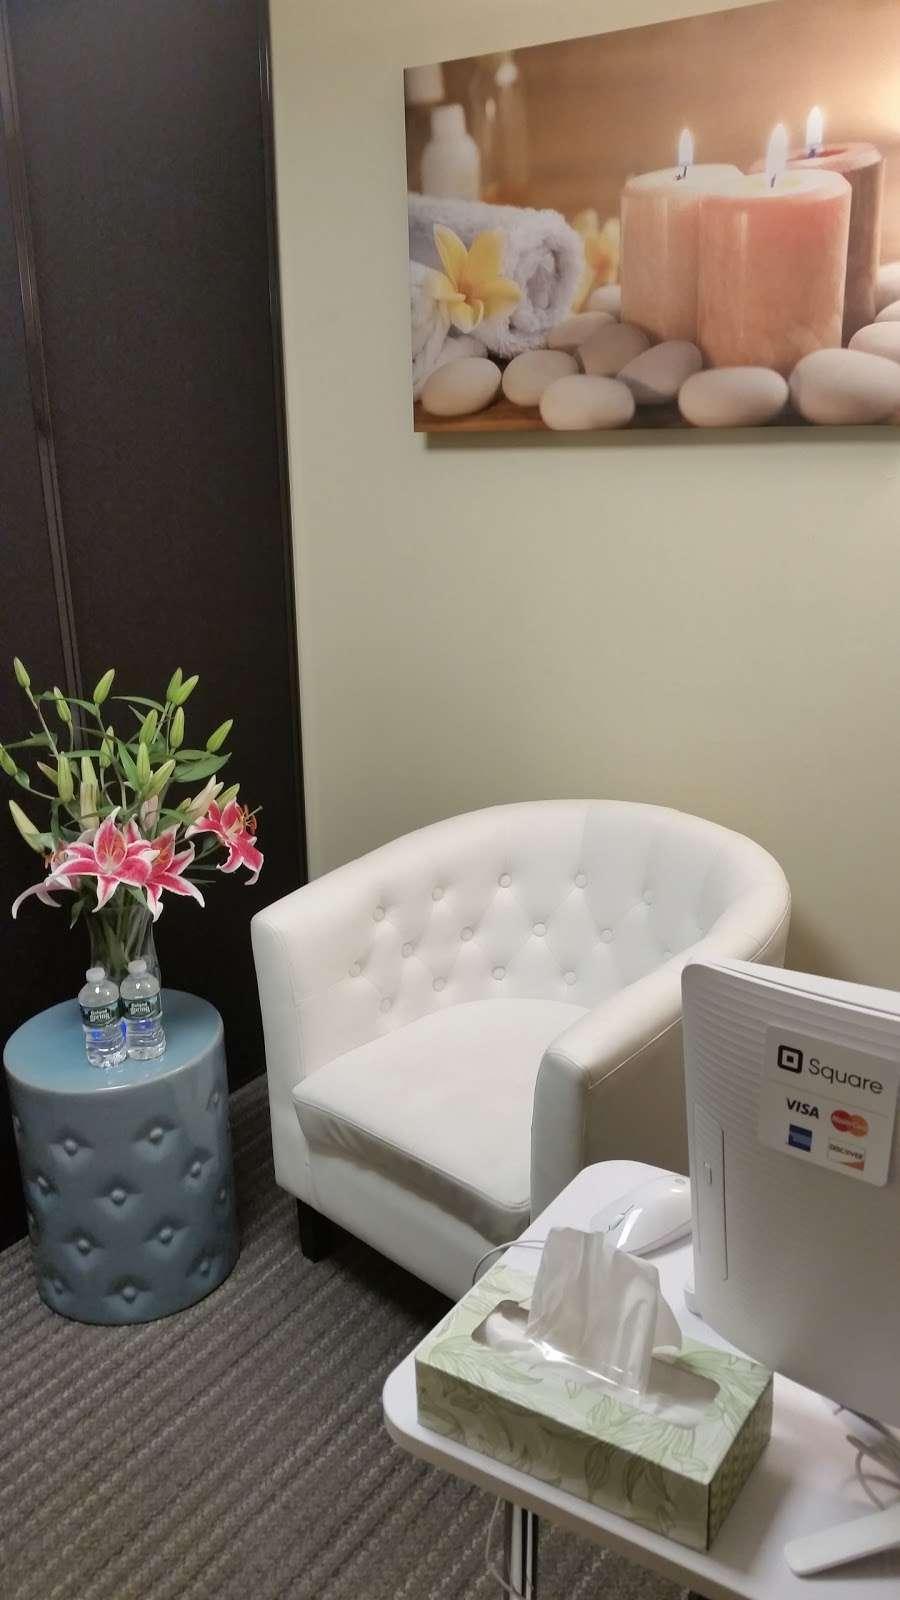 Beauty Studio NYC - hair care  | Photo 1 of 10 | Address: 222-15 Northern Blvd C-6, Lobby Level, Bayside, NY 11361, USA | Phone: (718) 489-4028